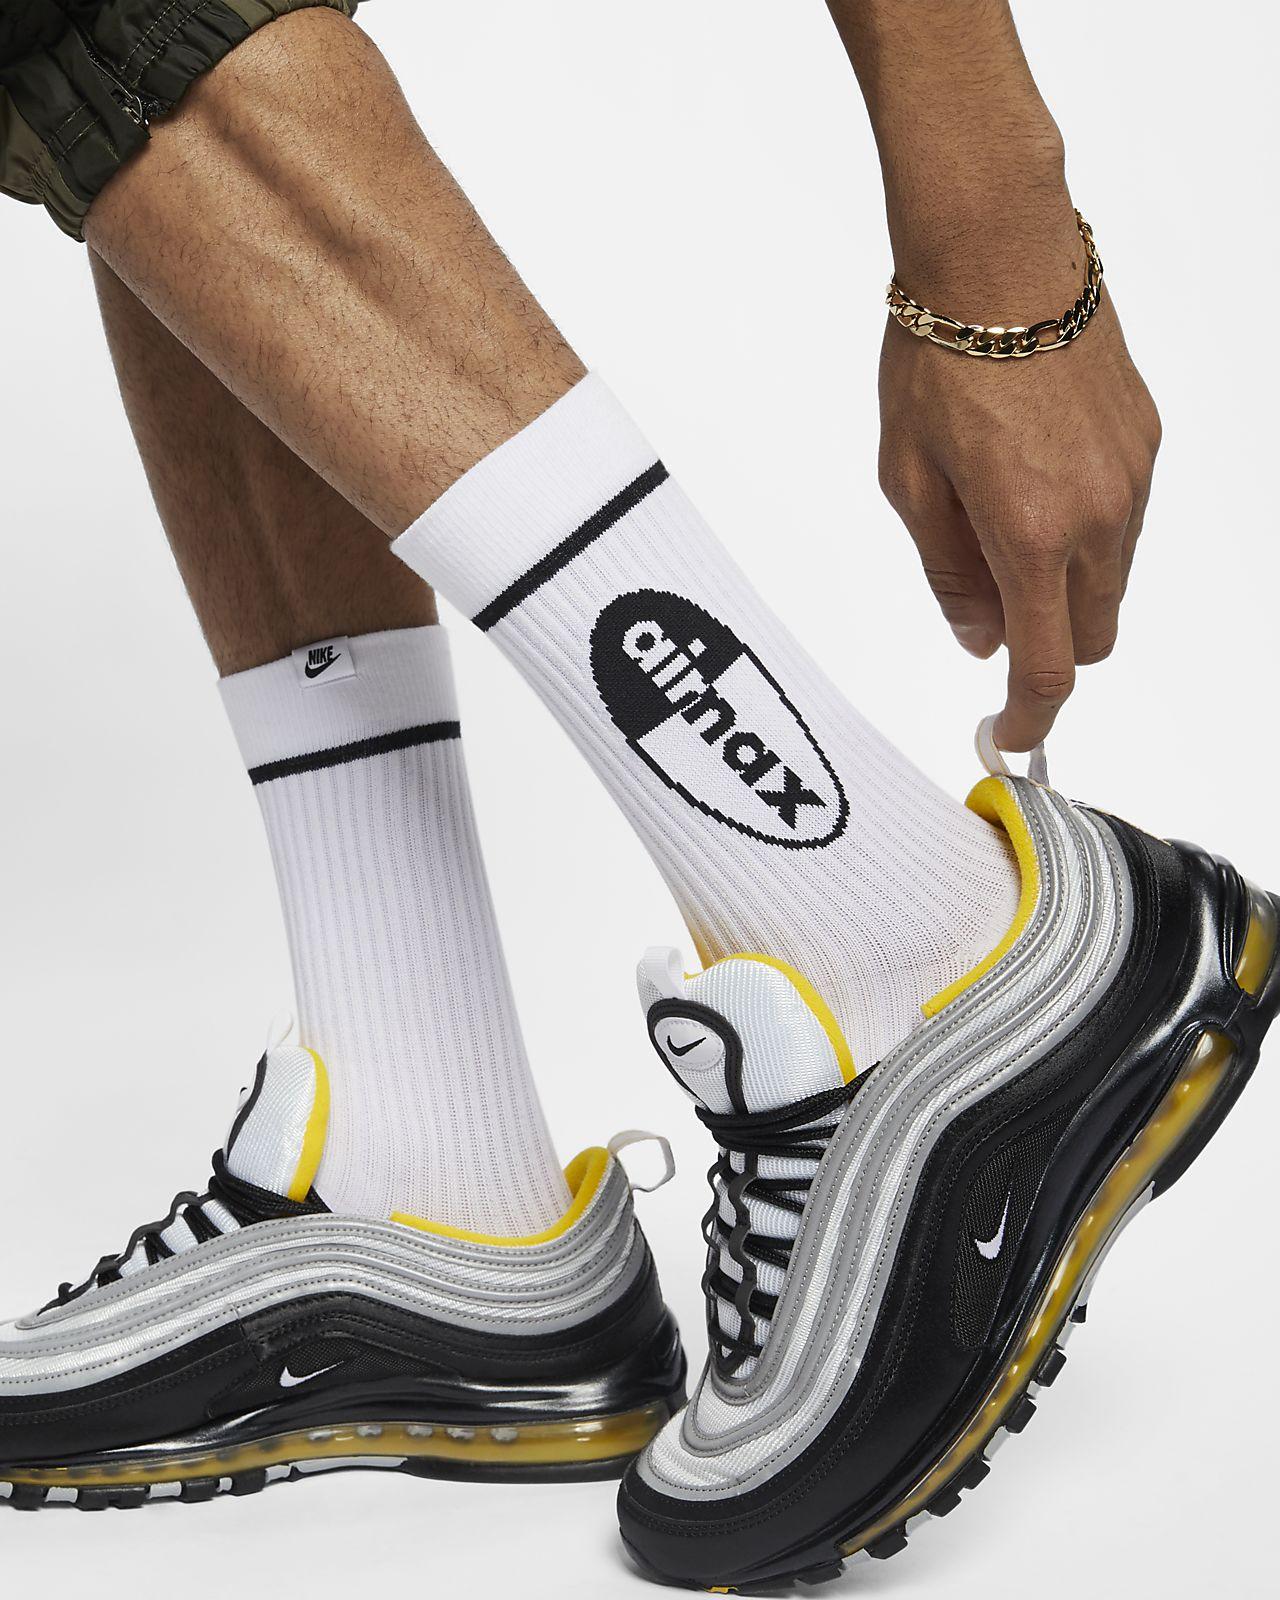 Nike Air Max Crew sokken (2 paar)